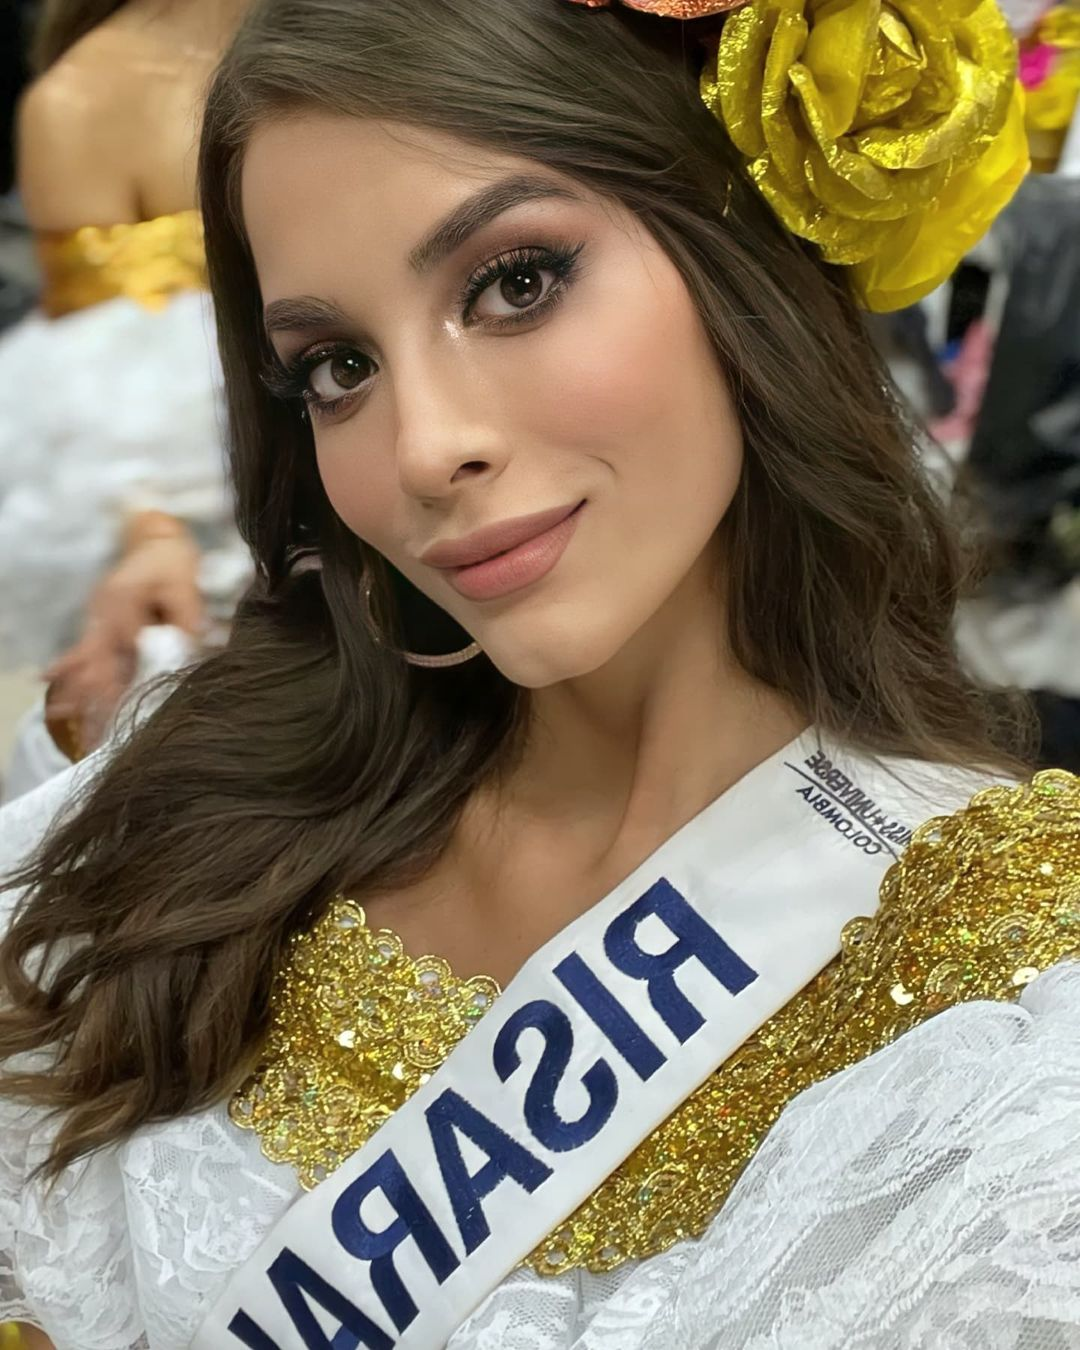 maria alejandra lopez perez, top 2 de miss universe colombia 2021/reyna hispanoamericana 2013/miss caraibes hibiscus 2014/miss colombia mundo 2015. - Página 4 24101411